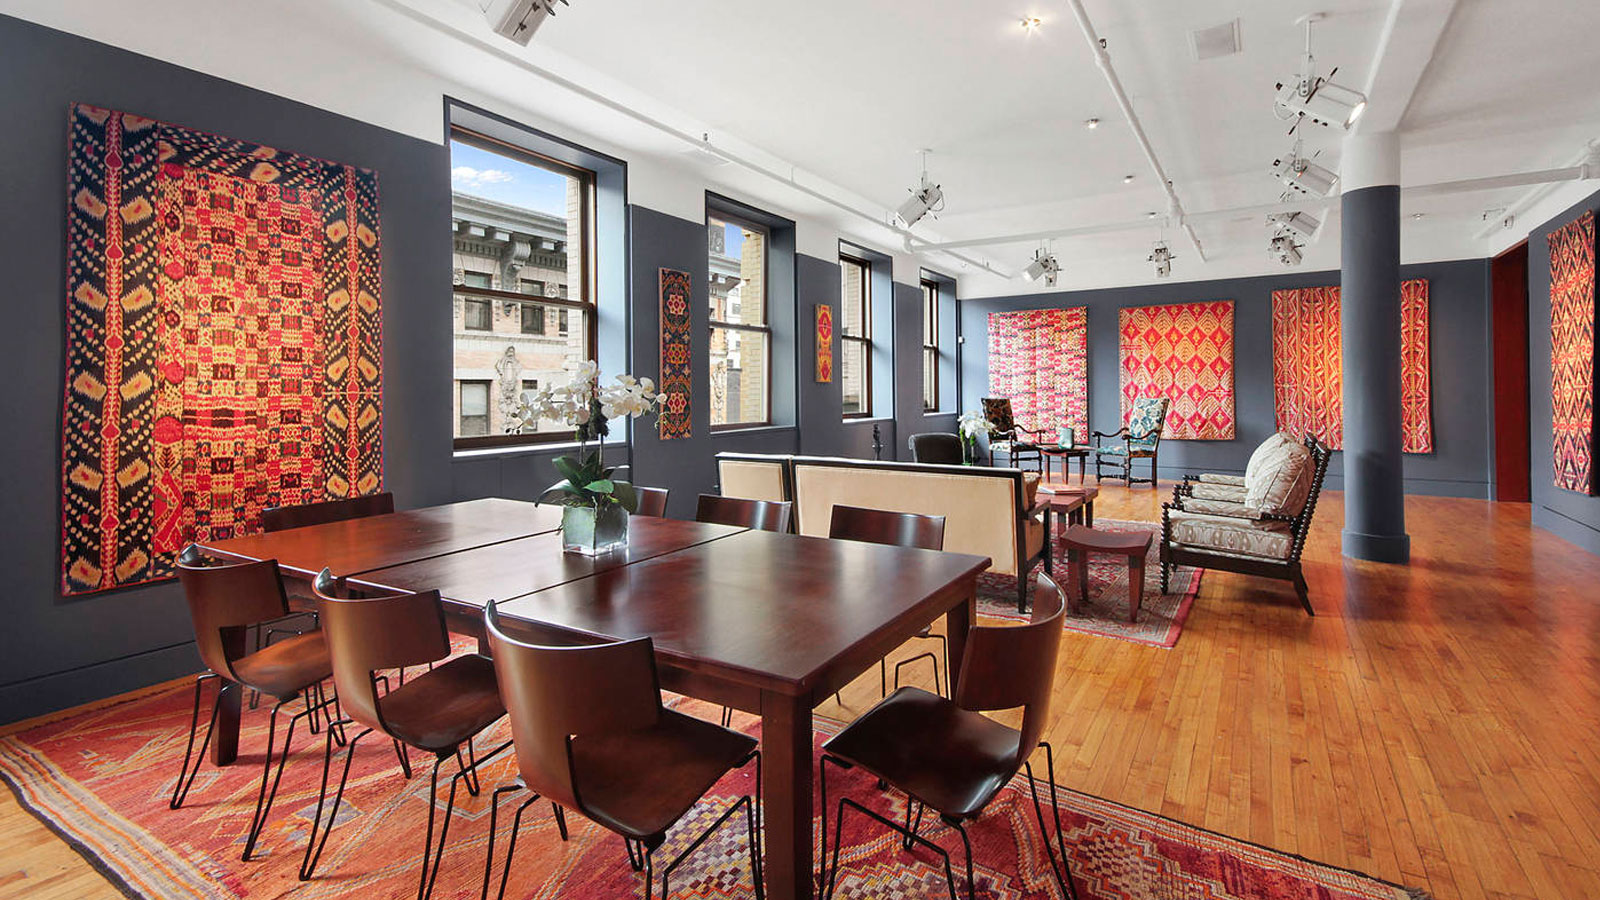 The Kensington, 73 Fifth Avenue